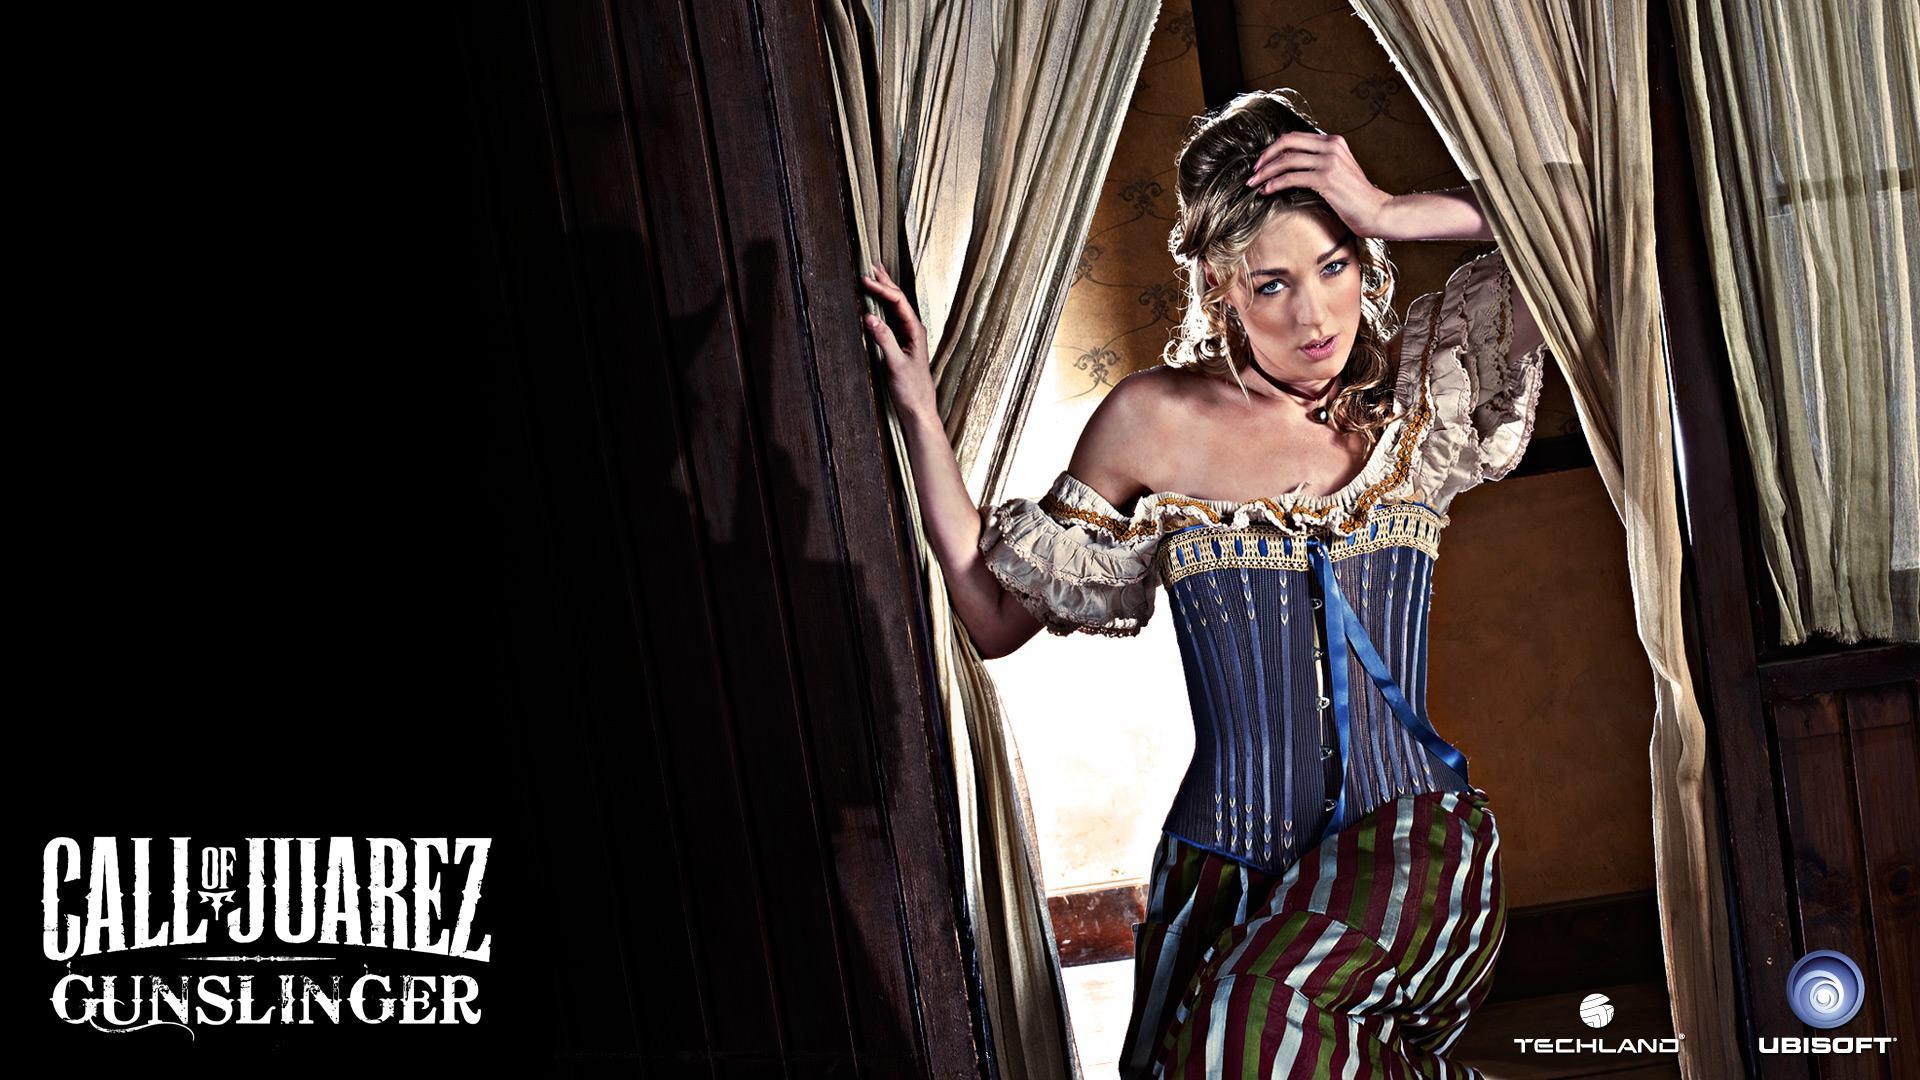 Ubisoft vuelve a la carga con Call of Juarez: Gunslinger [Teaser]